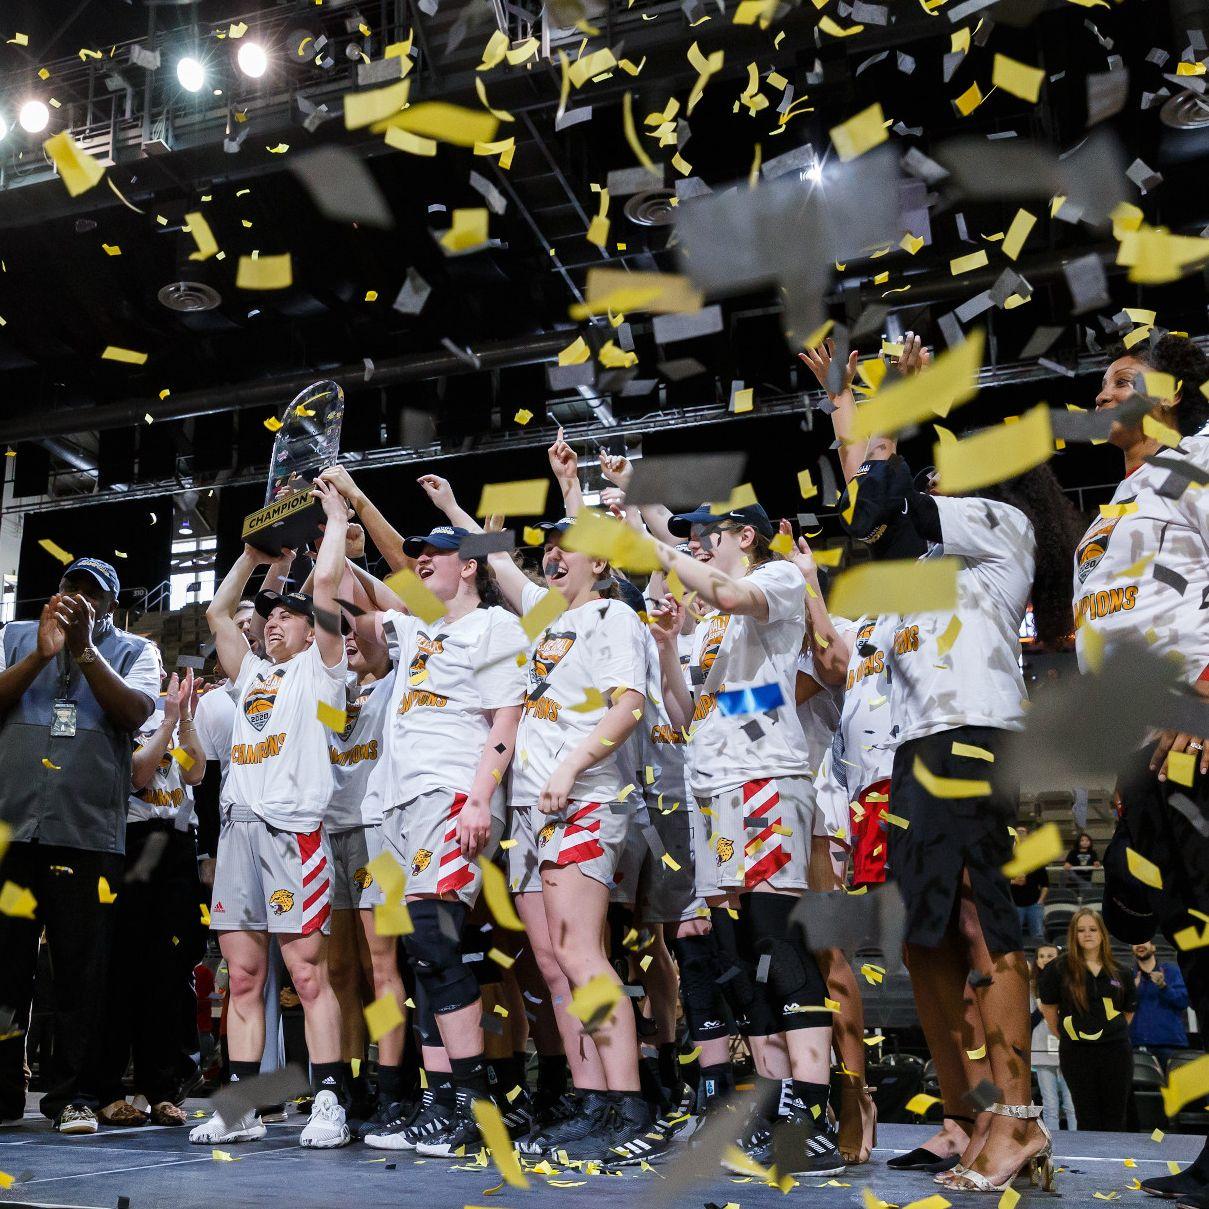 confetti falls from above as the IUPUI women's team celebrates